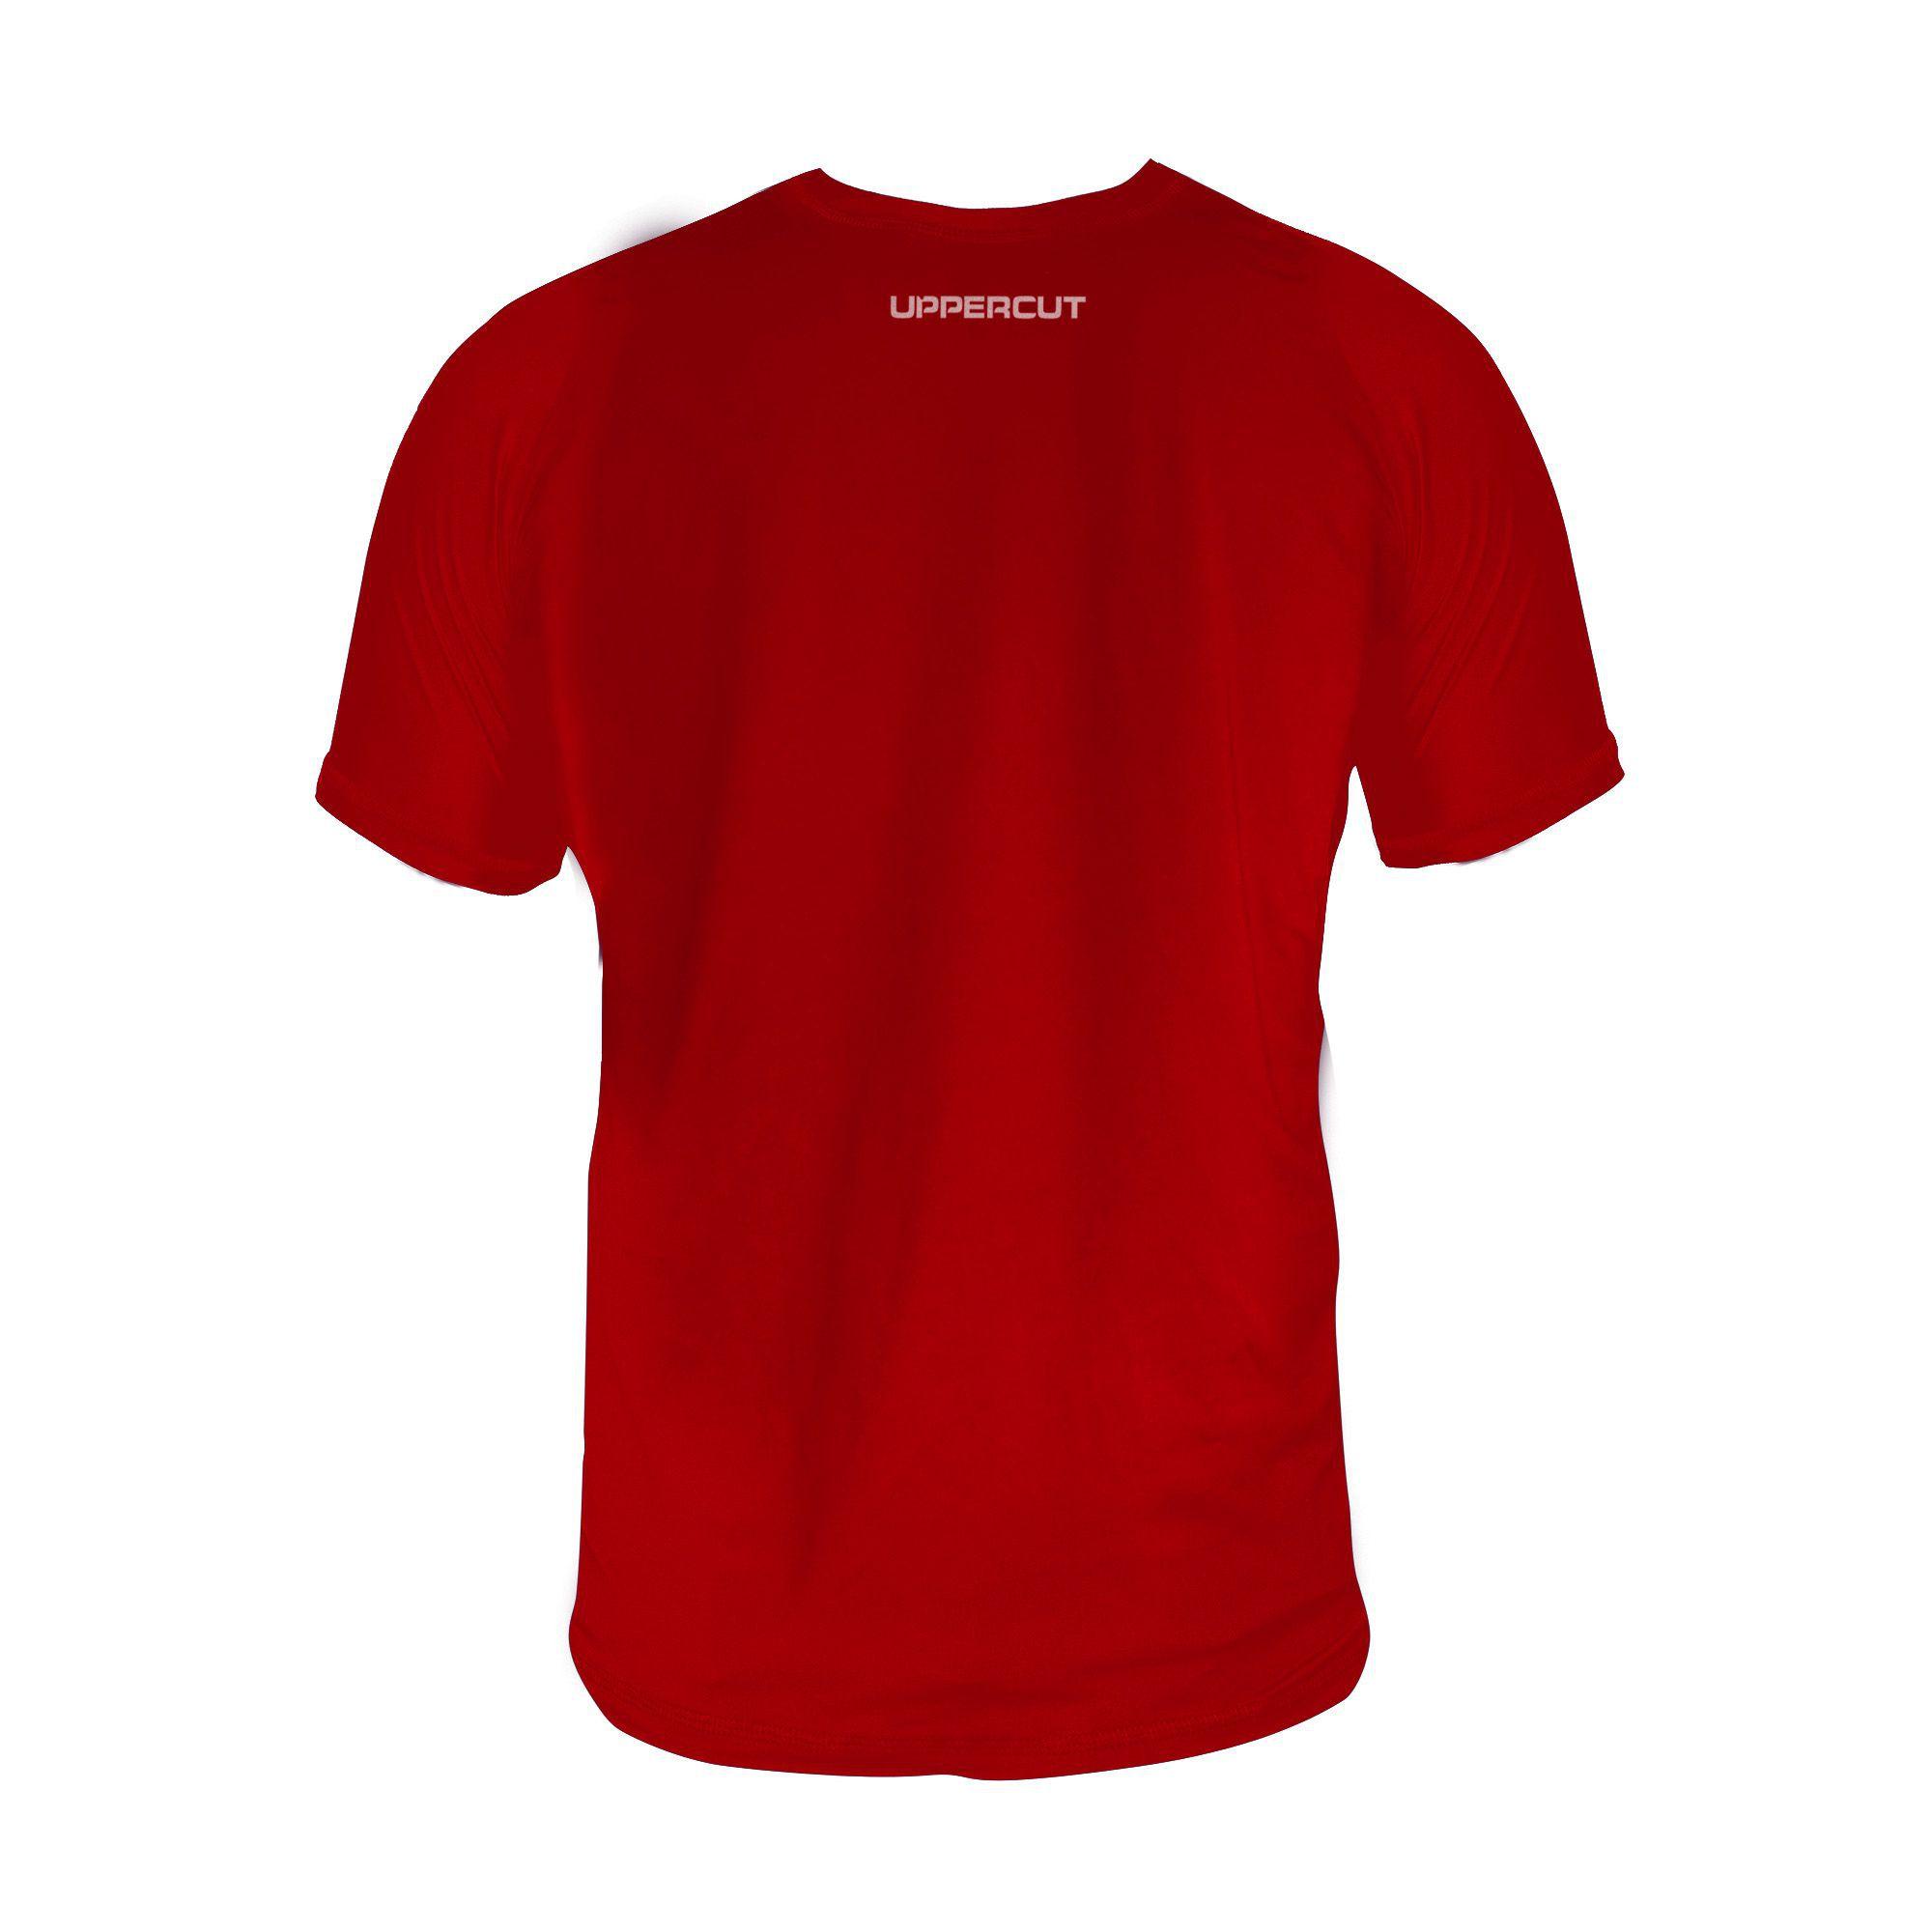 Camiseta Jiu Jitsu Leg Lock - Treino Dry Fit UV-50+ - Vermelha